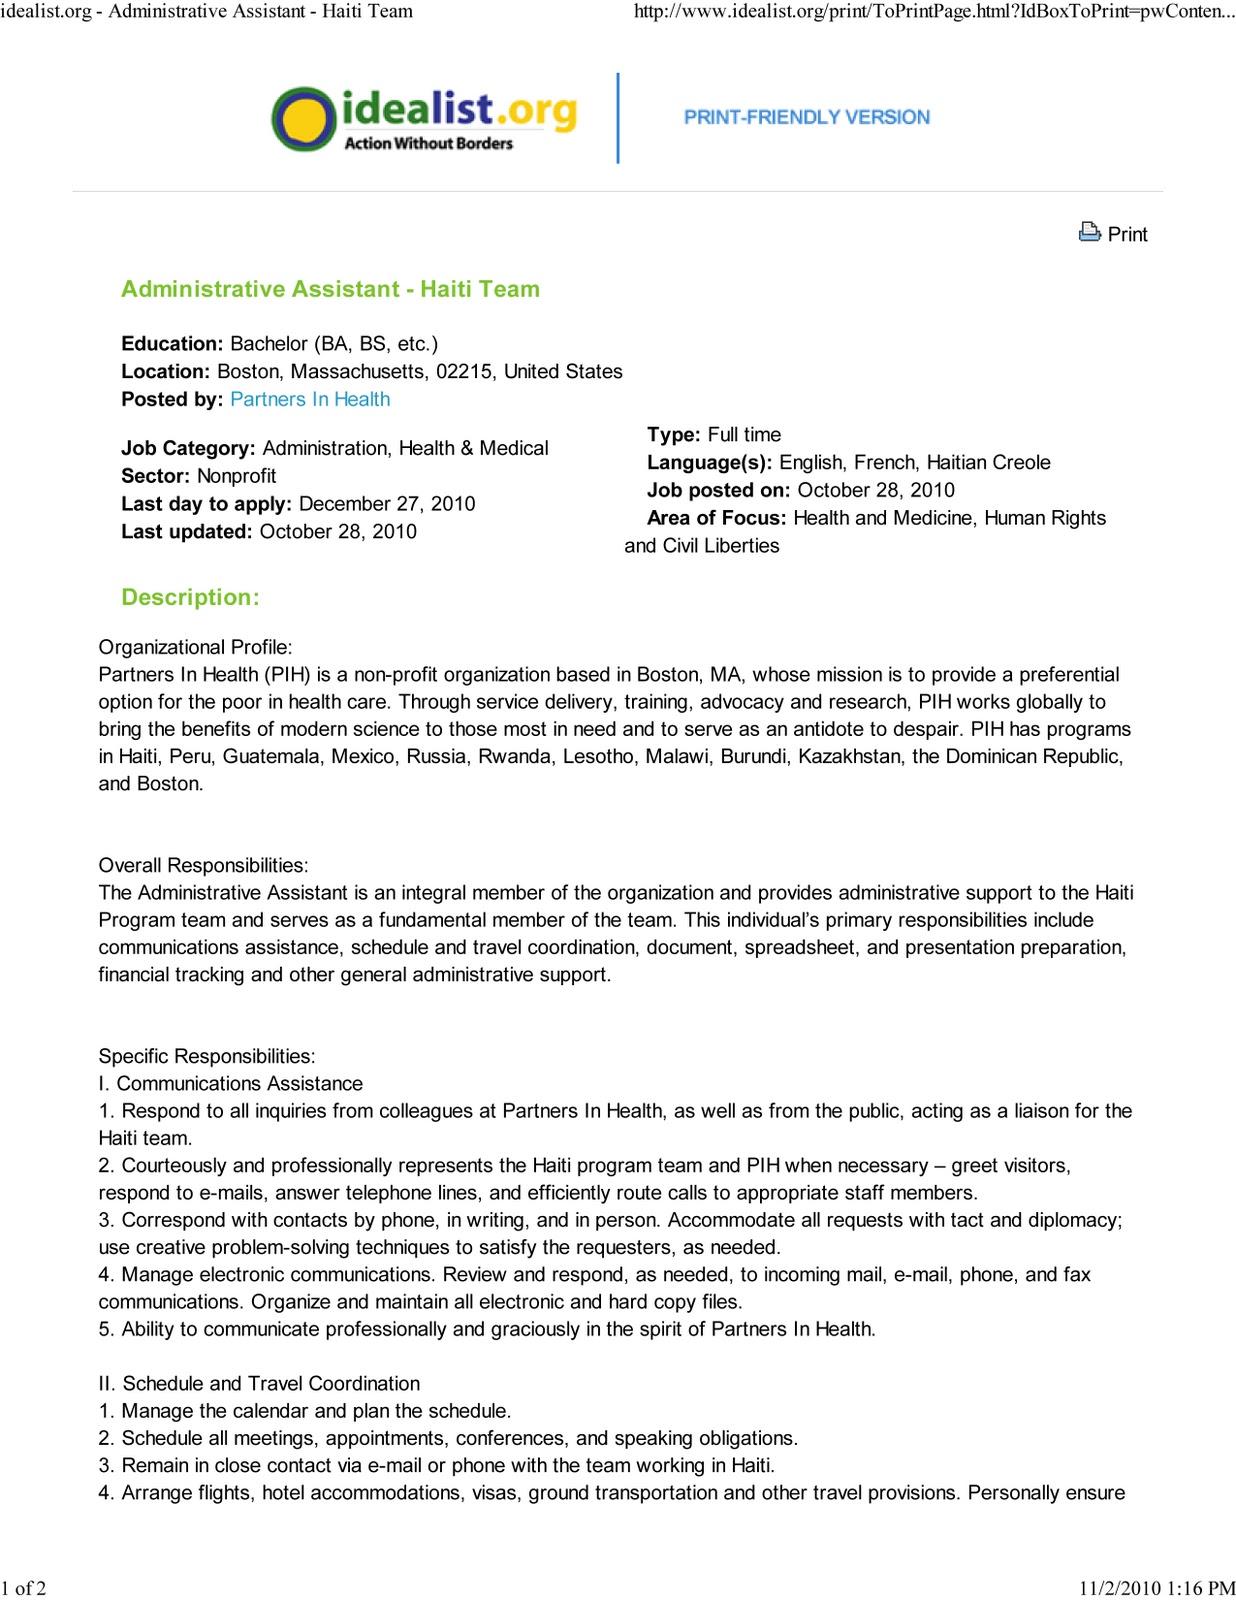 016 Admin2bassistant Essay Example Virginia Tech Phenomenal Essays Reddit Prompts 2018 Sat Requirements Full